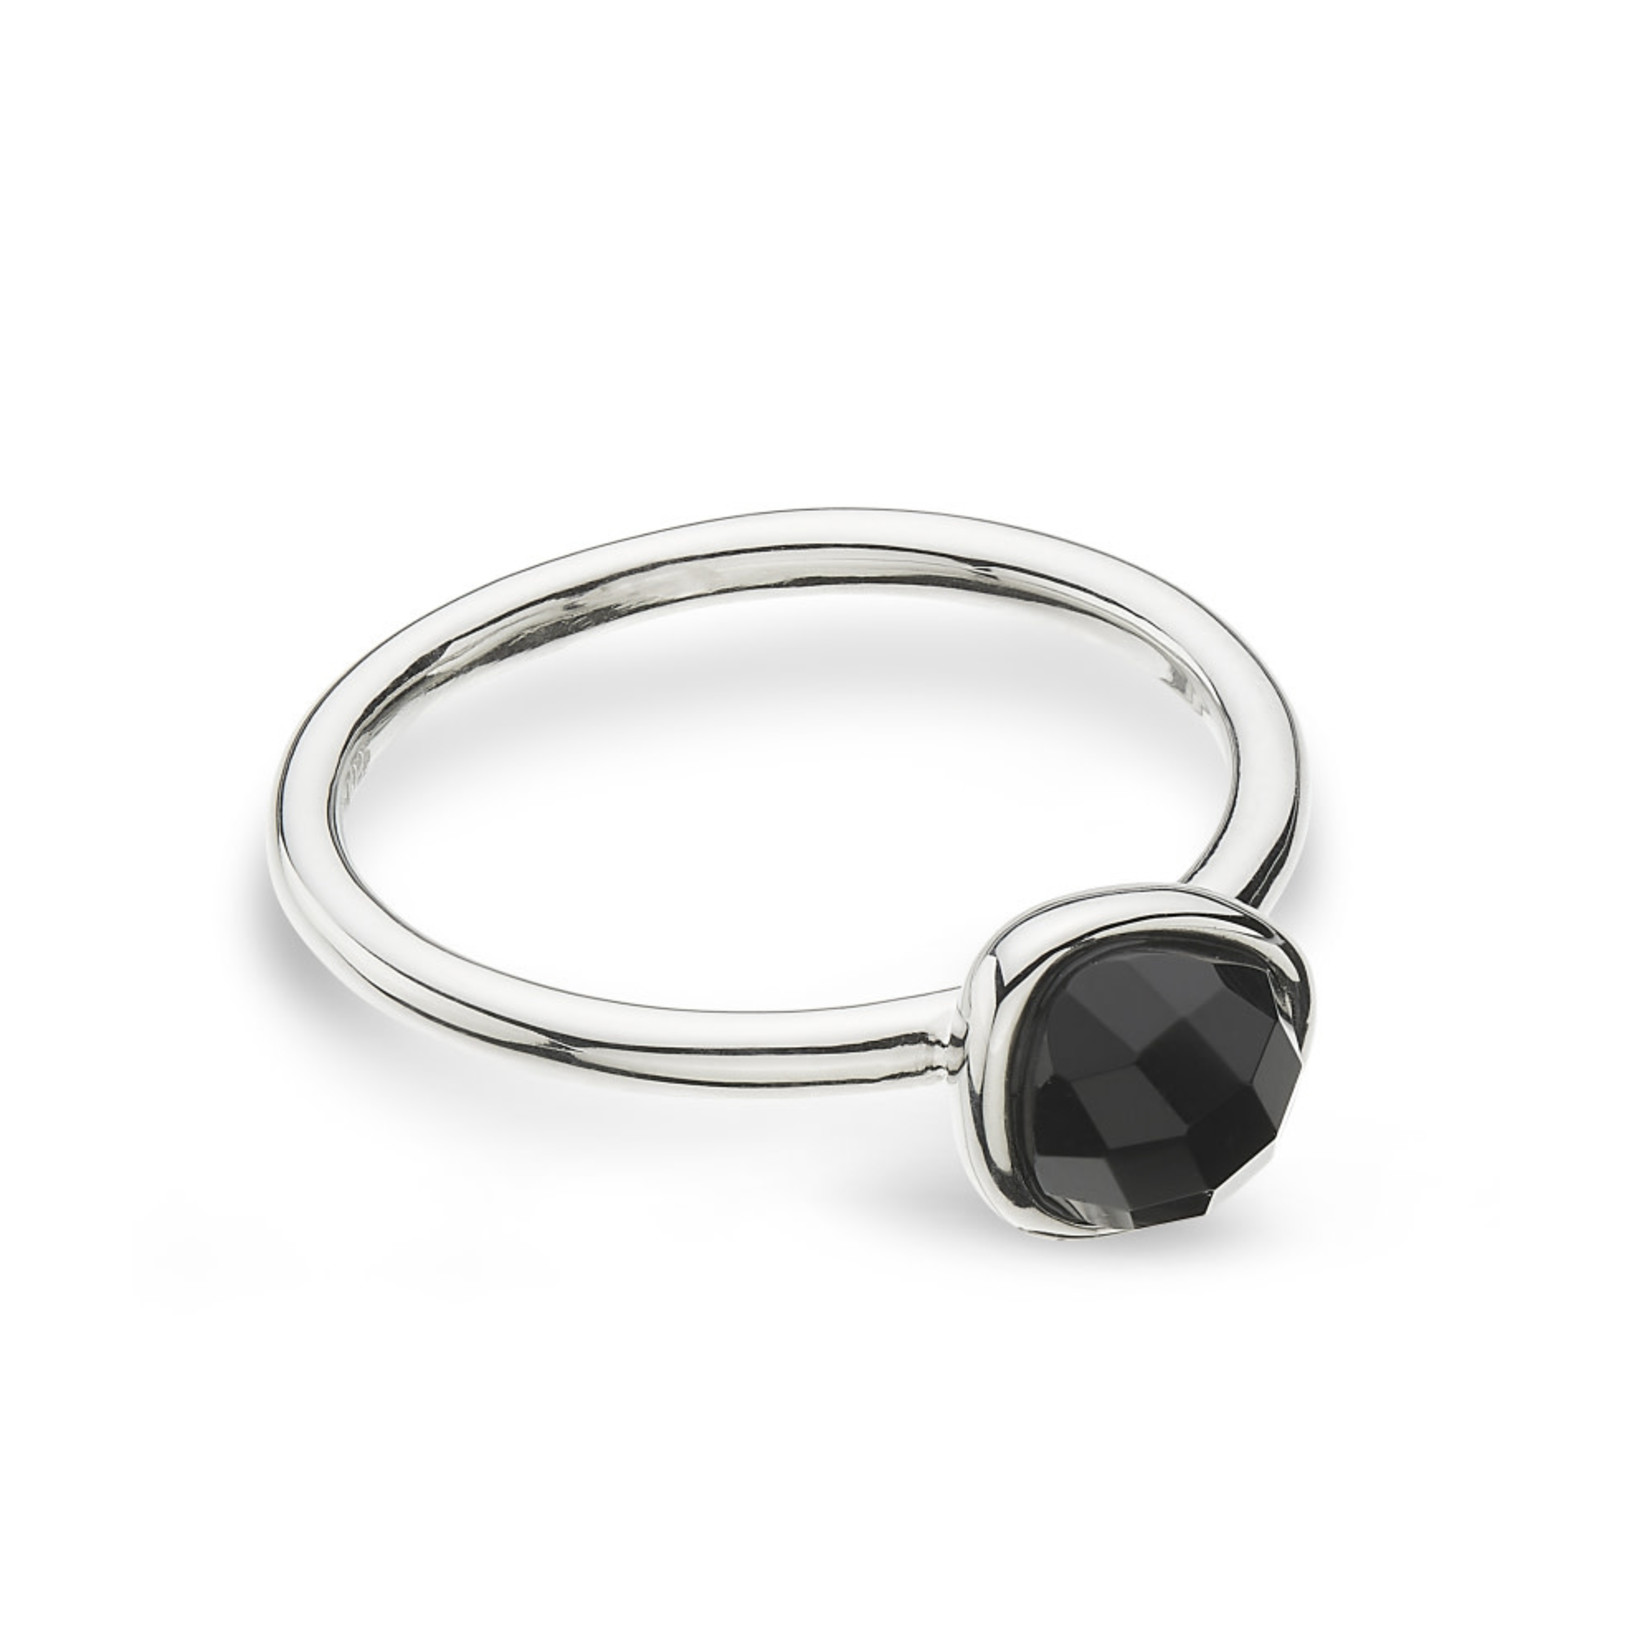 Sterling Silver KH Rg(US 7.5) Coast Pebble Black Agate Mini Rg